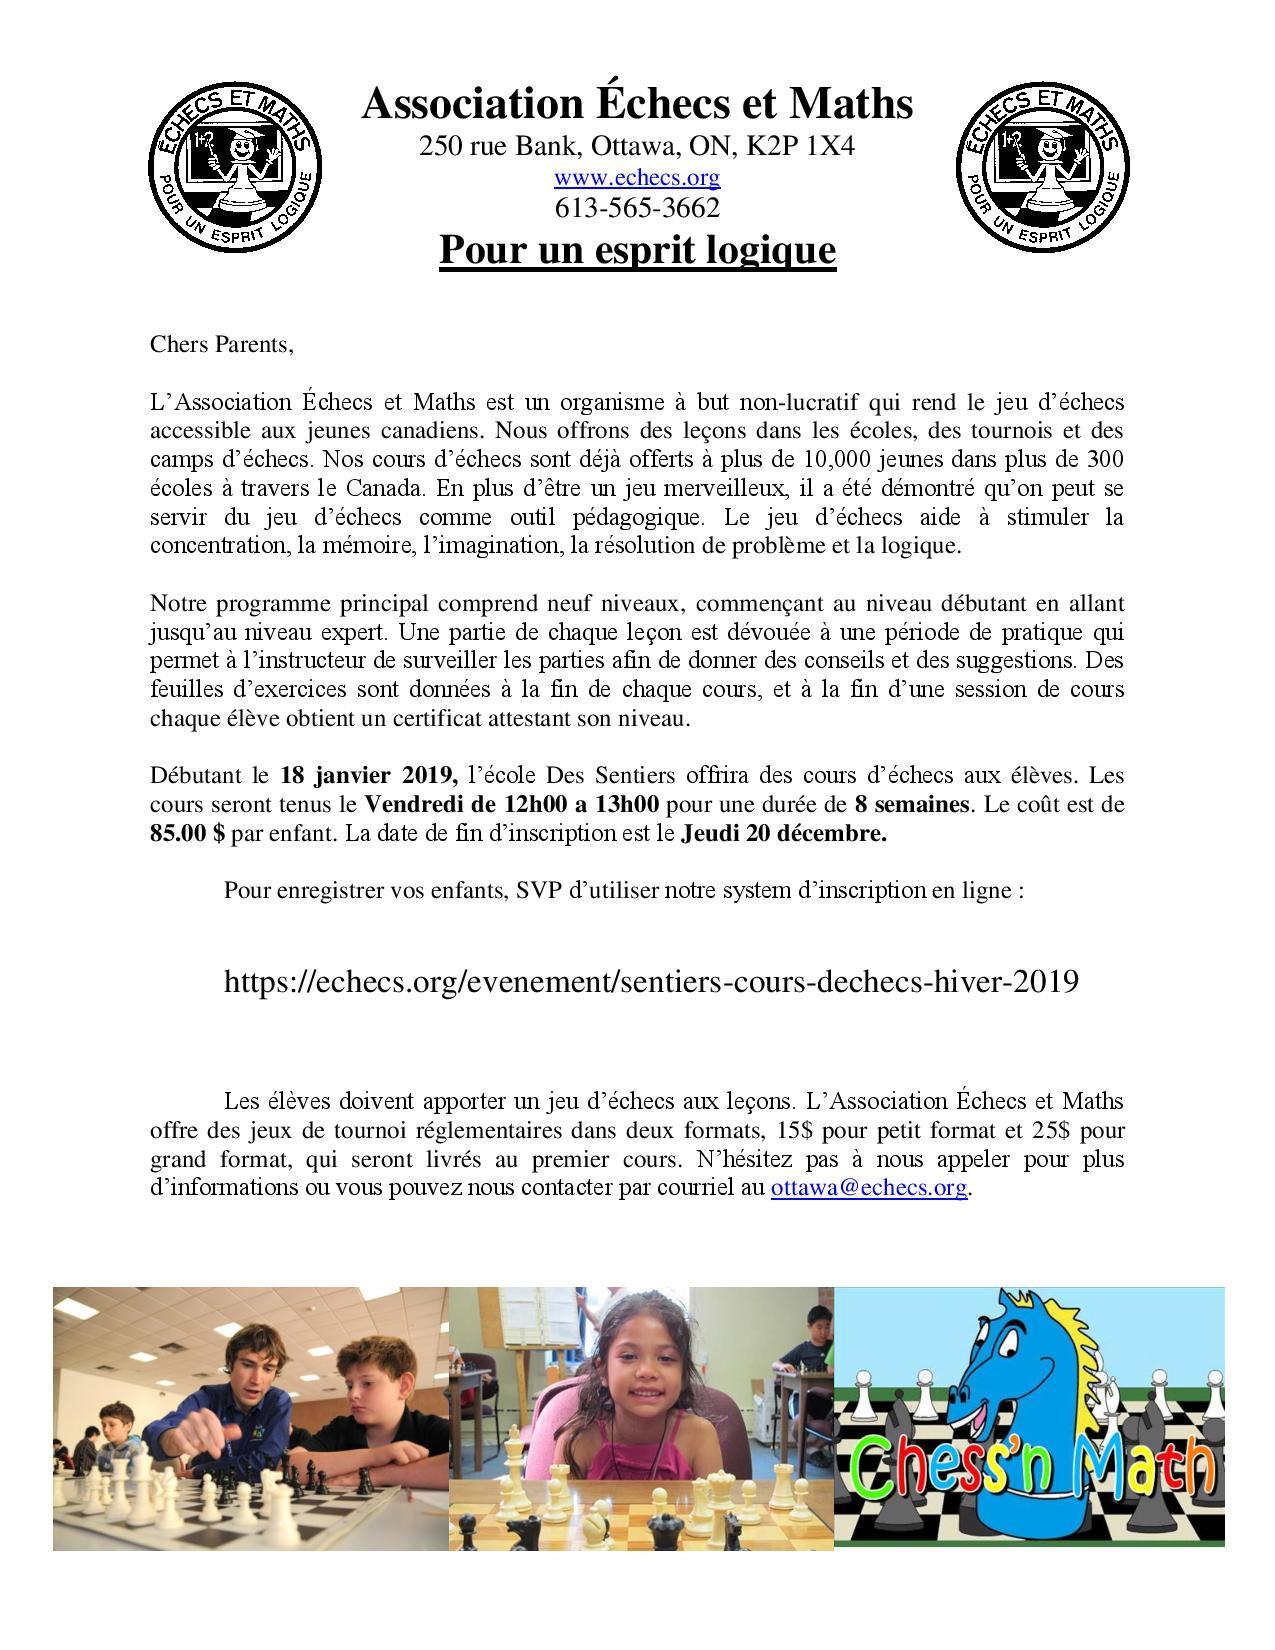 des sentiers winter 2019 registration